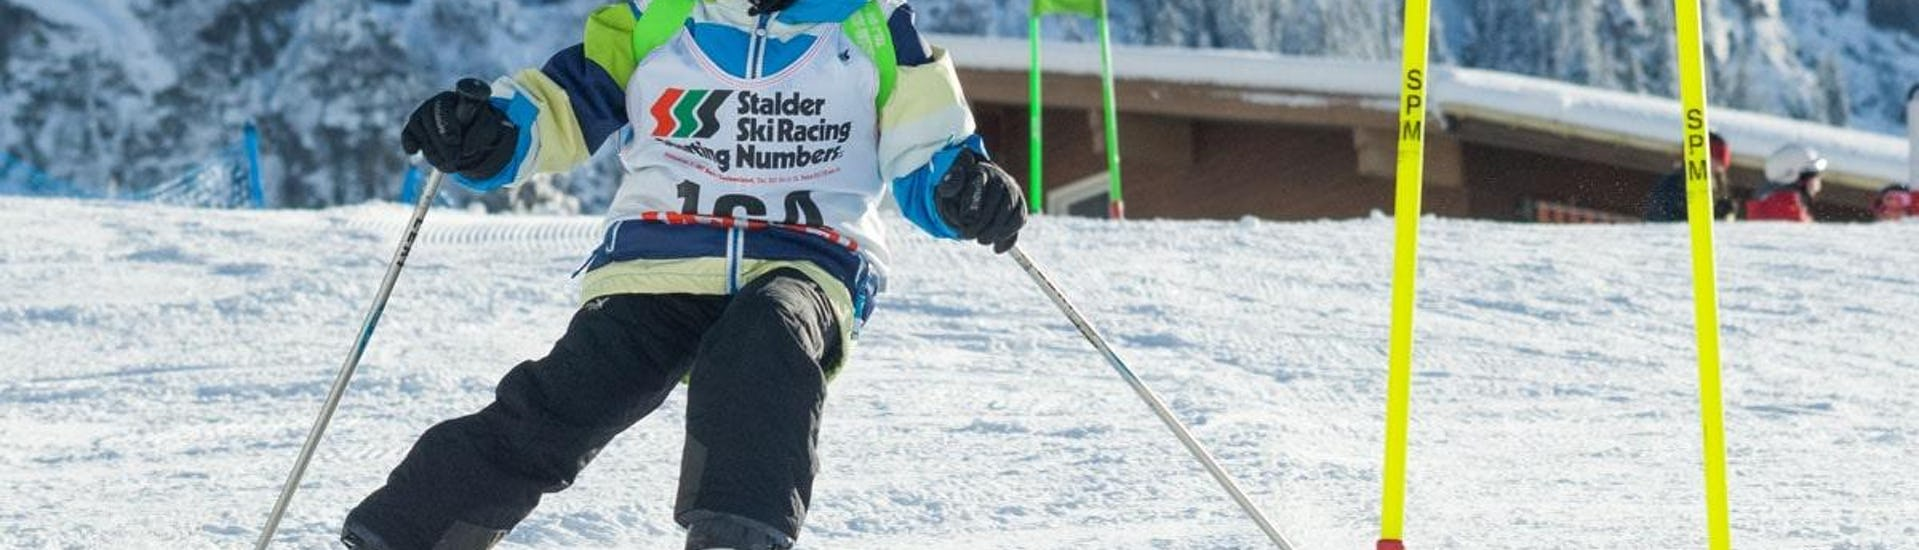 Ski Privatlehrer Kinder - Nachmittag - Alle Altersgruppen